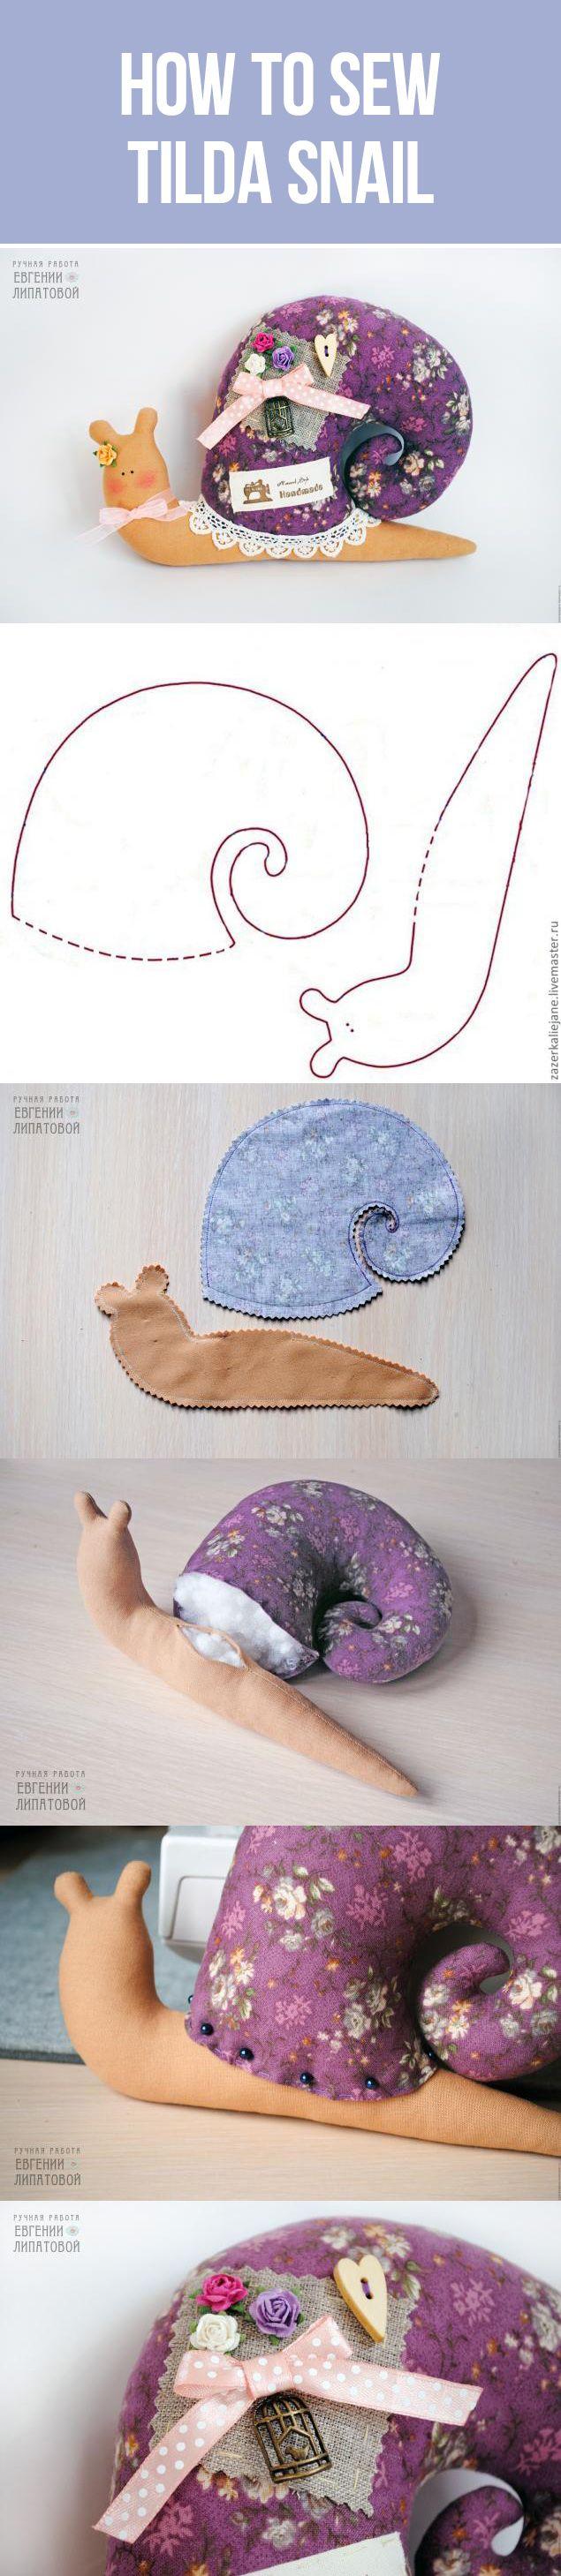 How to sew Tilda Snail toy, pattern + tutotial | Шьем улитку в стиле Тильда, мастер-класс с выкройкой